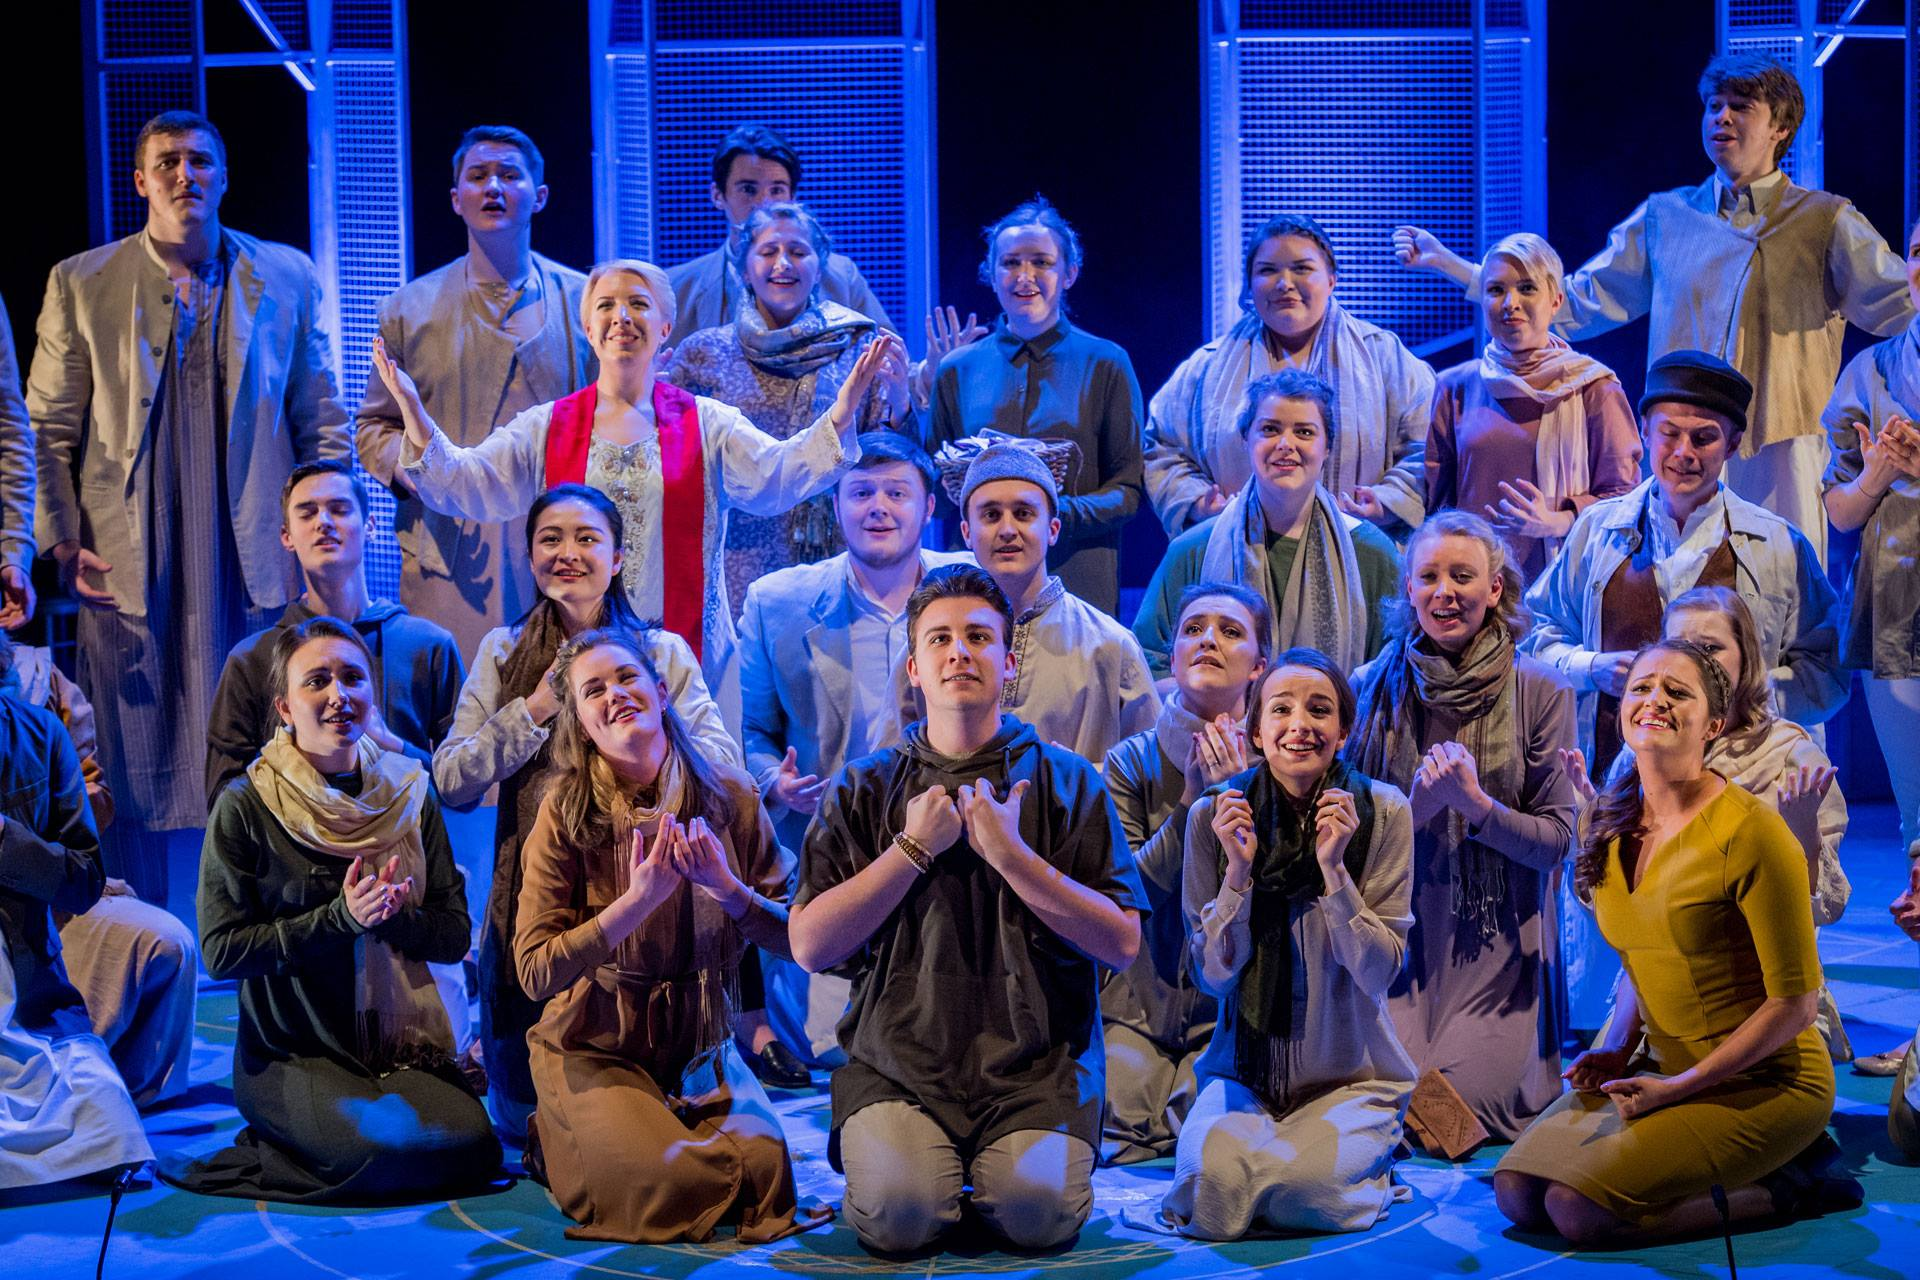 RNCM Chorus in Theodora 2016